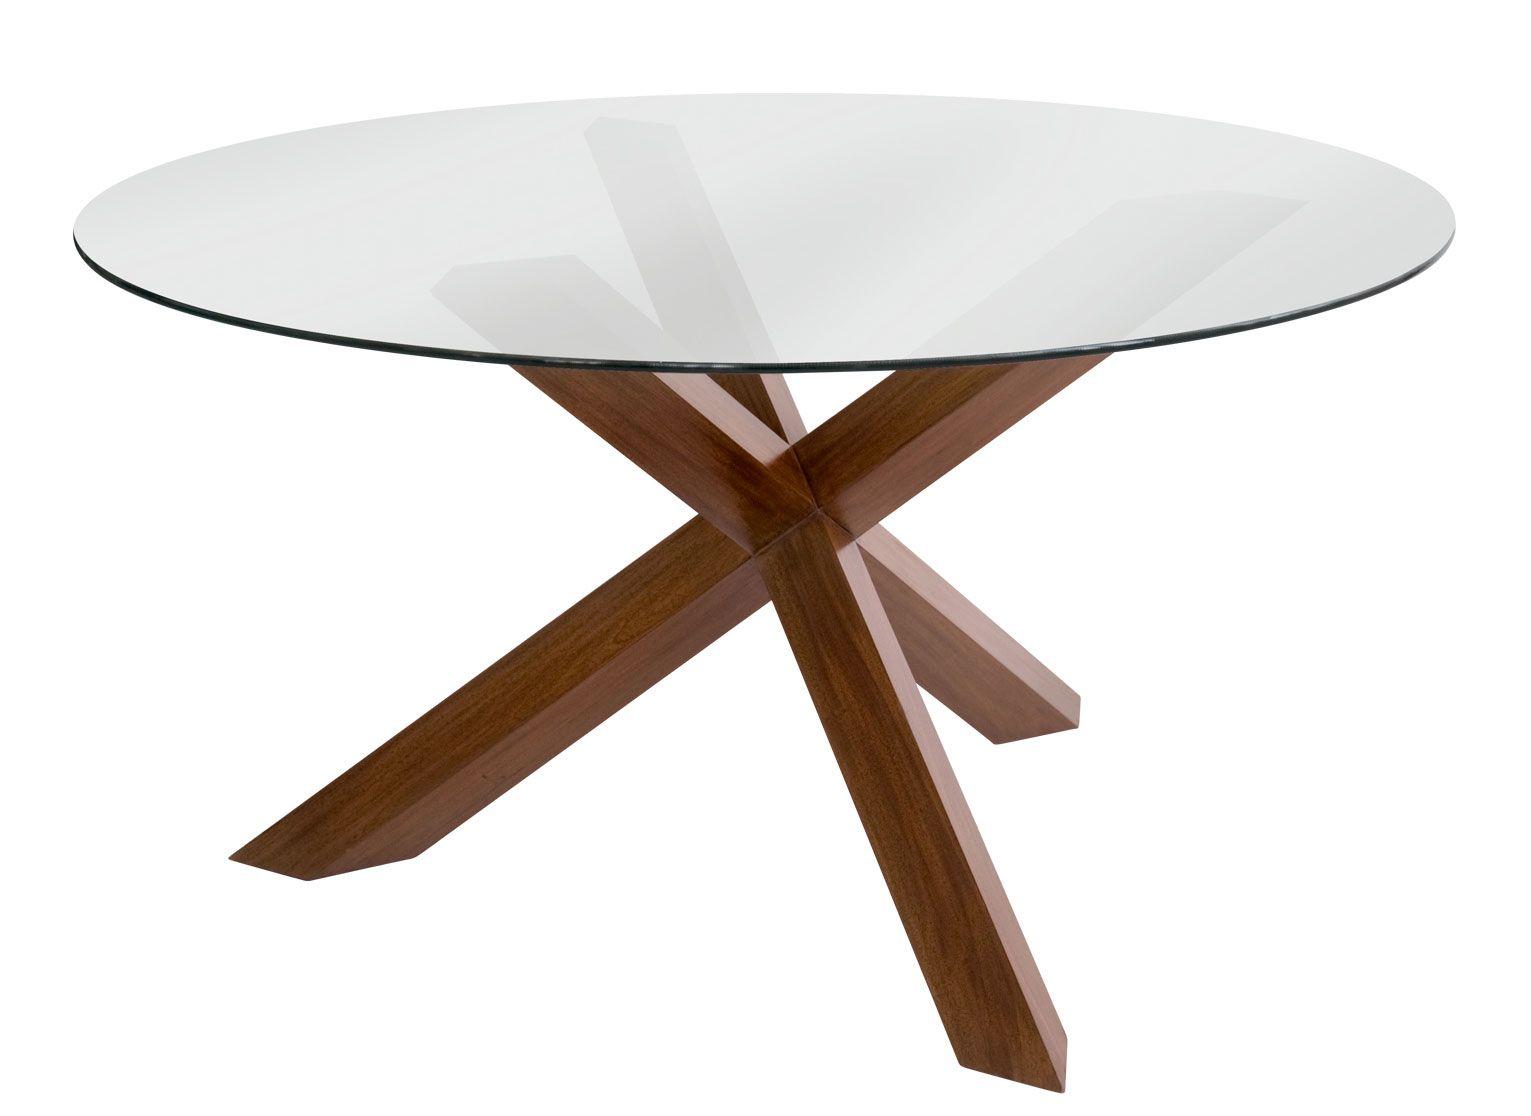 Base mesa redonda nutt material madera de roble base mesa - Mesa comedor redonda ...